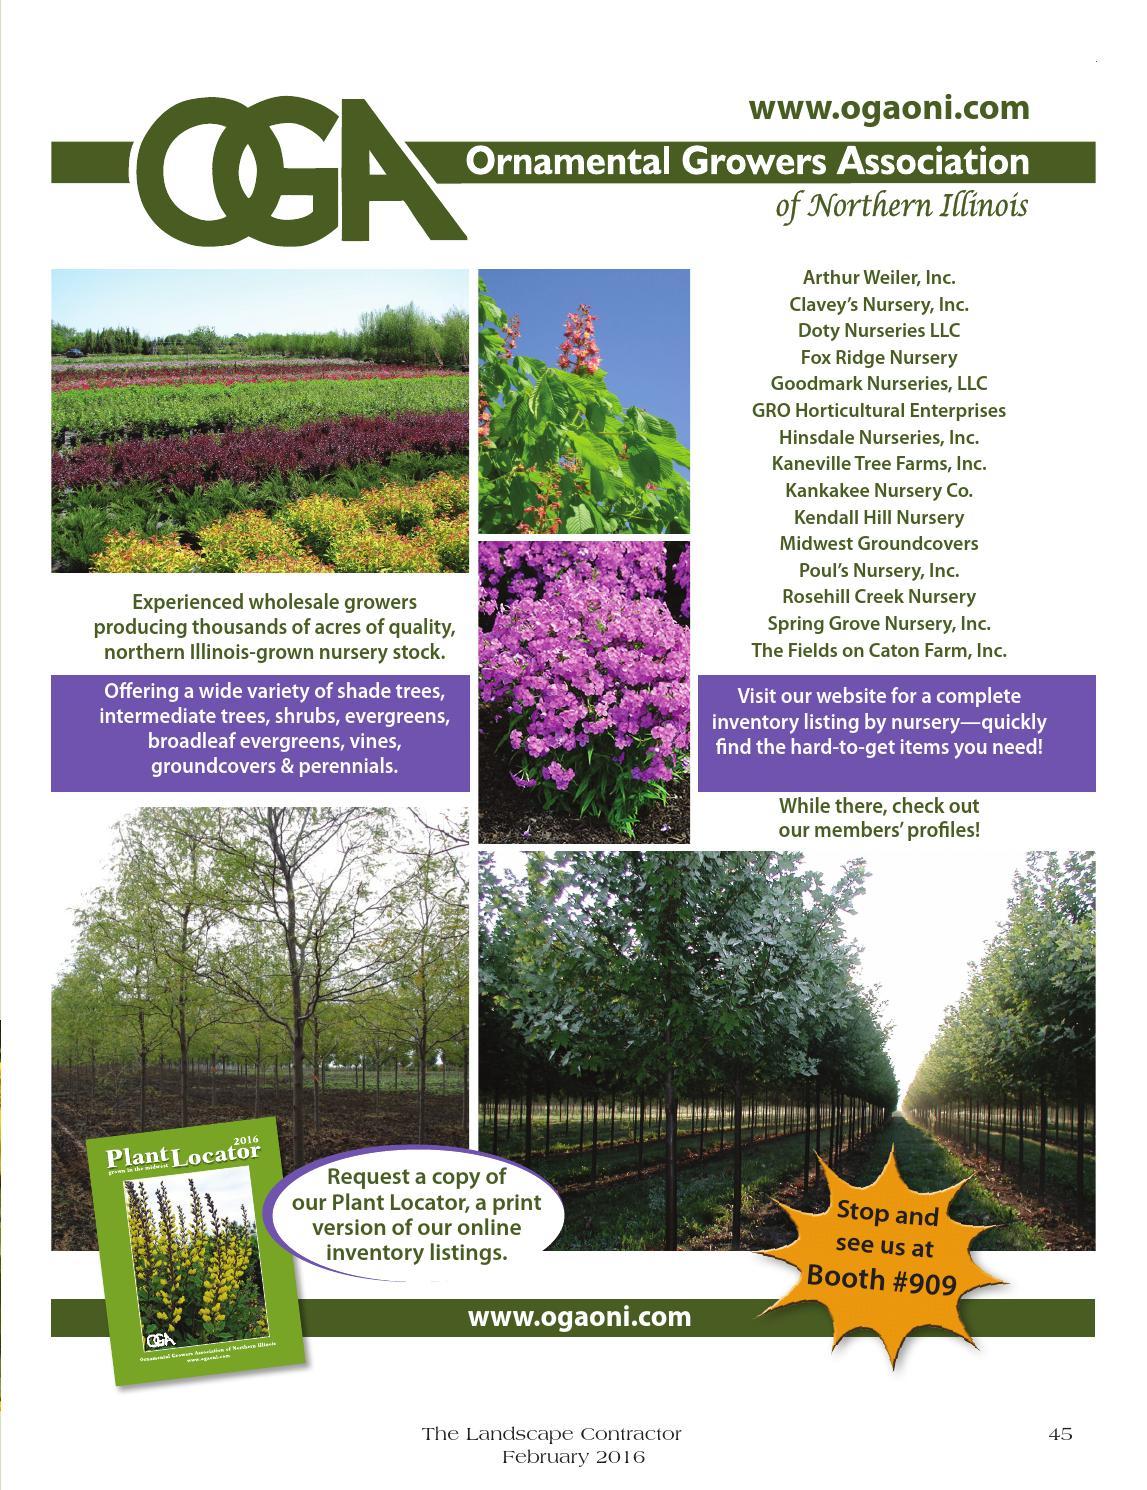 The Landscape Contractor Magazine